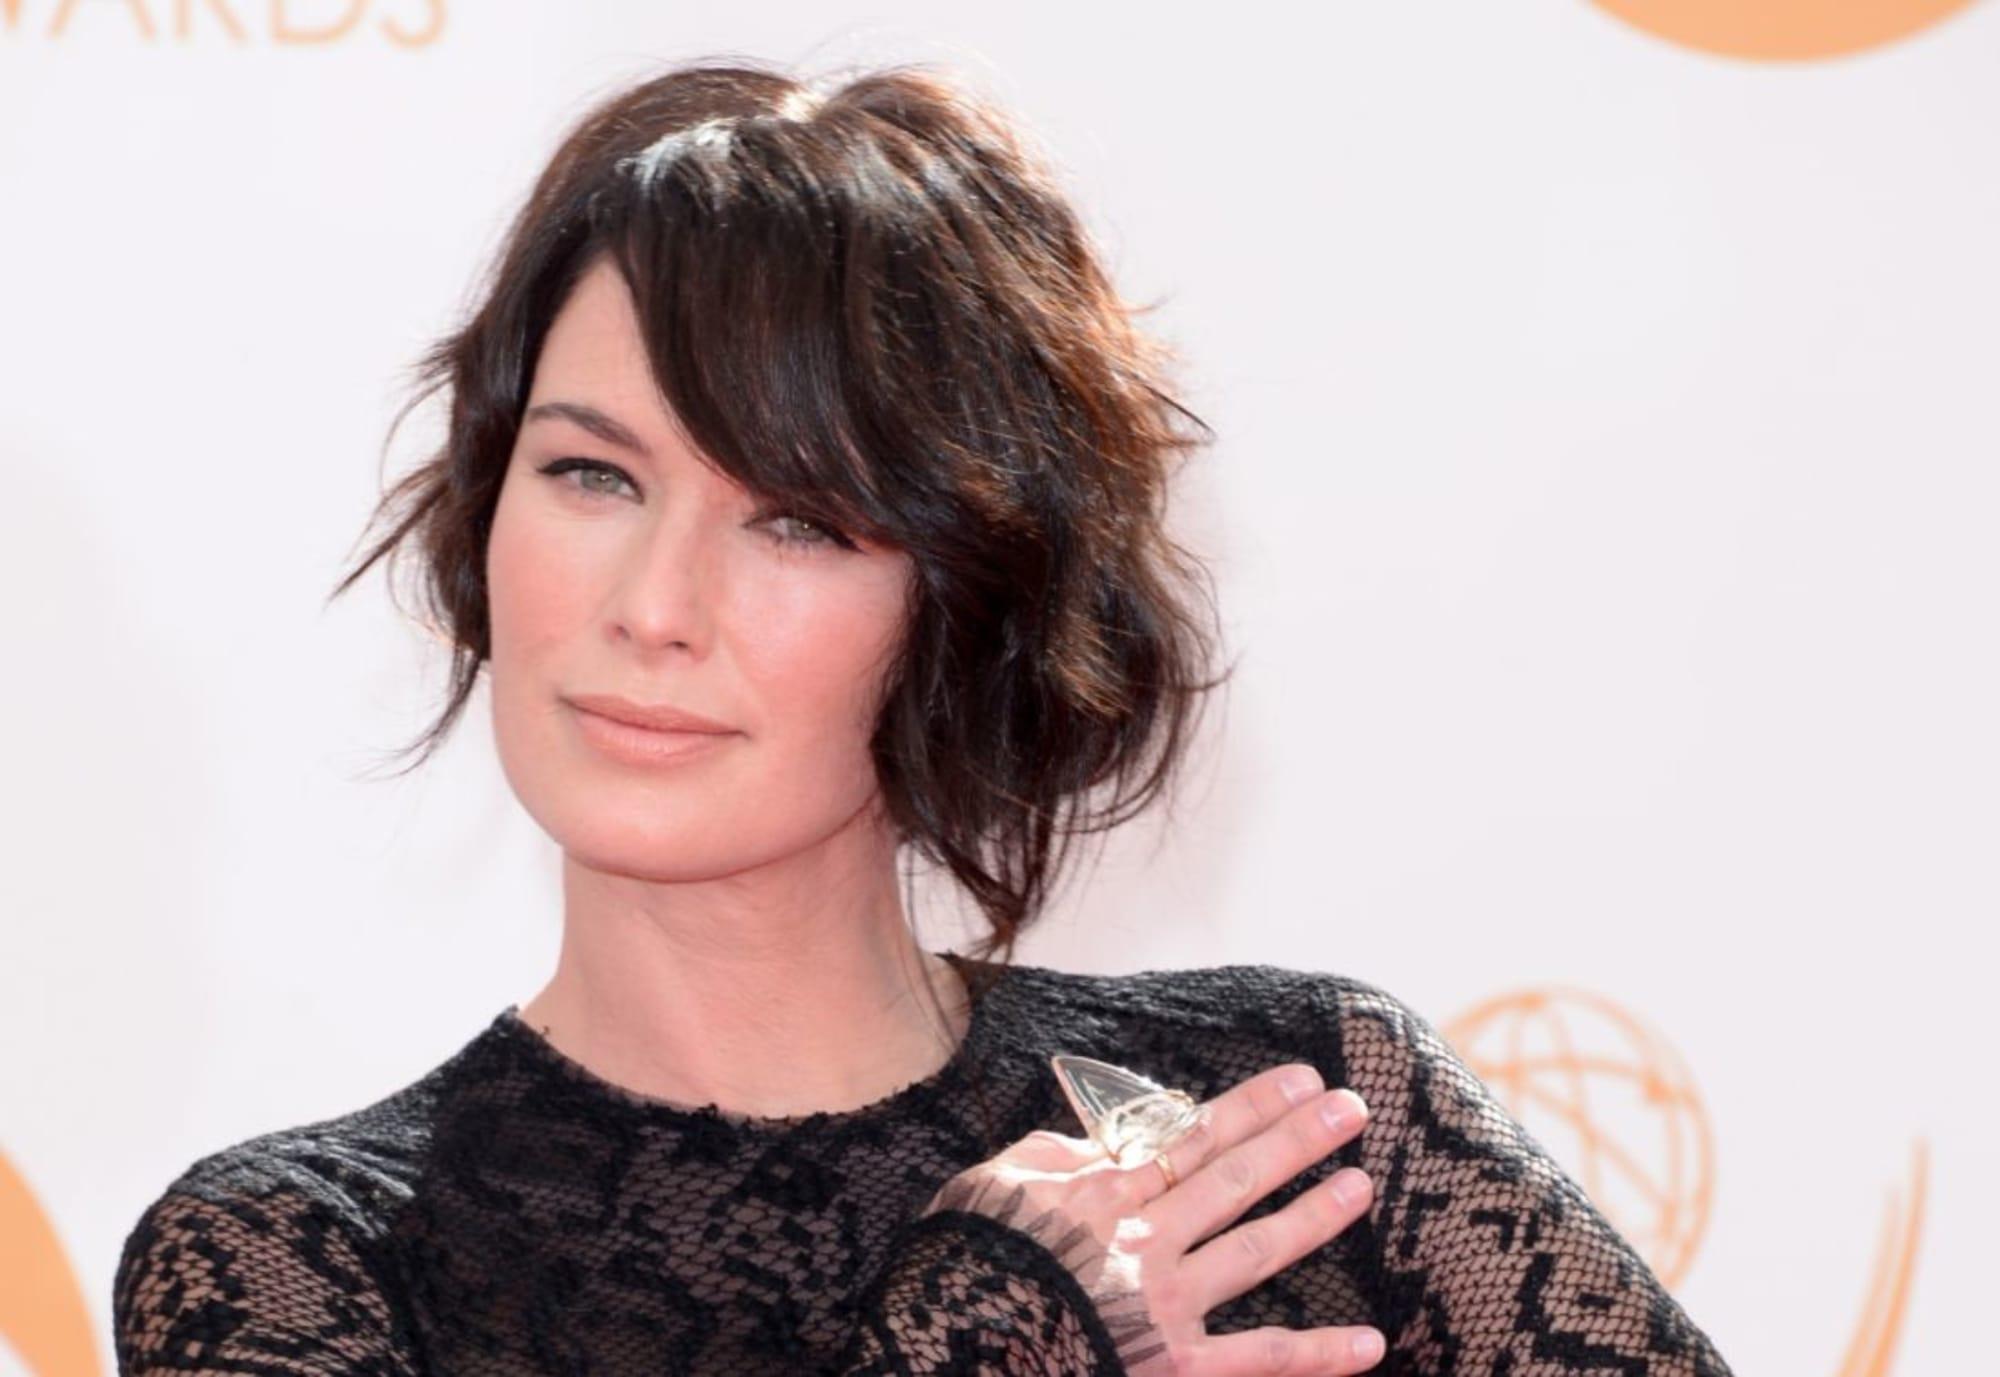 Lena Headey dating an Ozark star, Kit Harington criticizes British government, and more